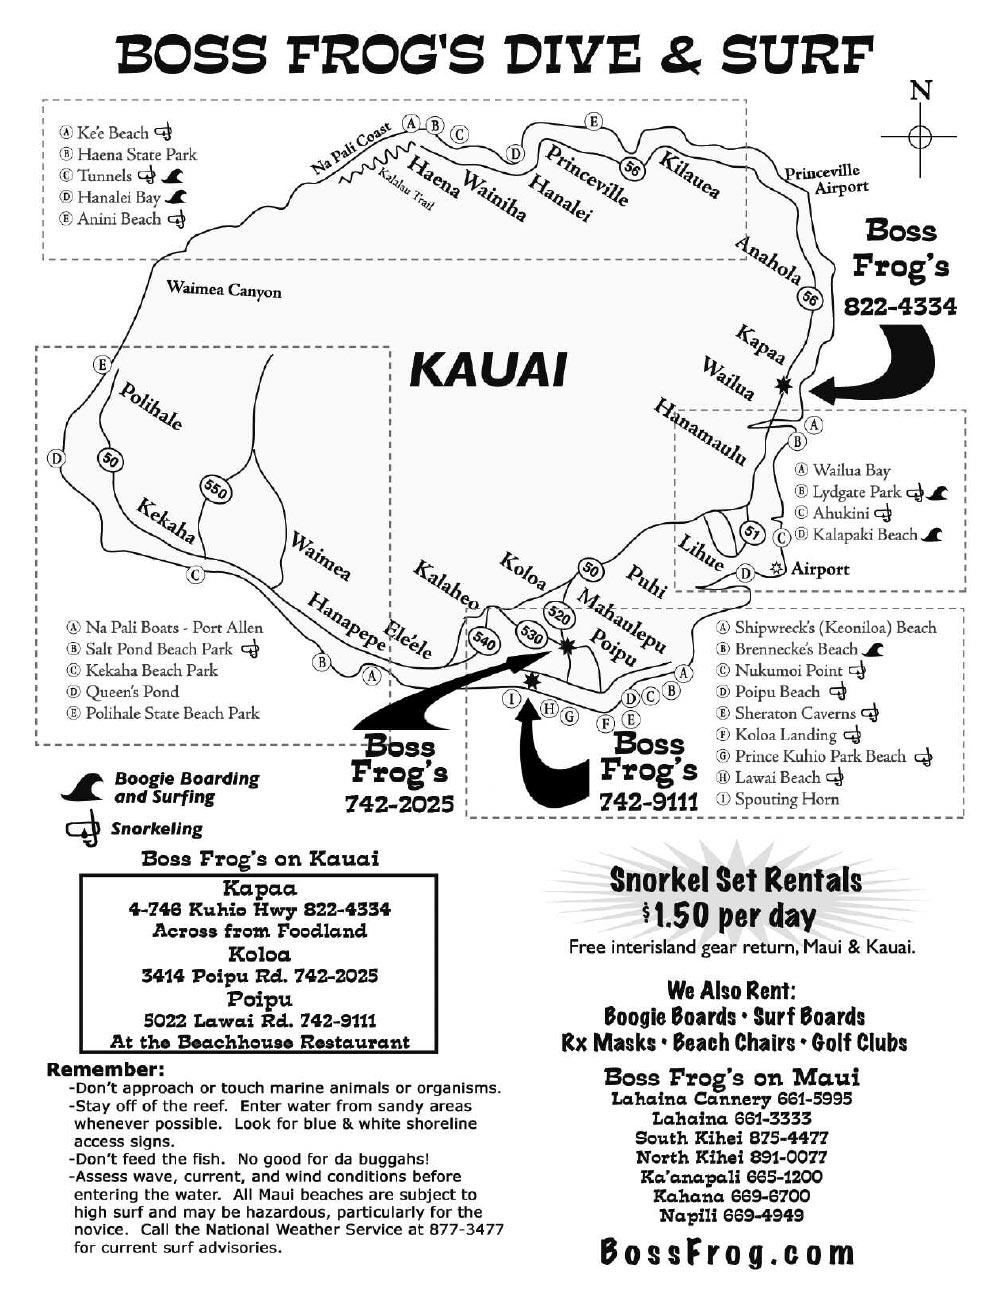 Maps - Boss Frog's Snorkel, Bike & Beach Rentals Kauai Snorkeling Map on maui snorkel map, kauai camping map, kauai flood zone map, lydgate park kauai map, kauai restaurant map, kauai road map, kauai ahupua a map, oahu river map, kauai hunting map, kauai cities map, kauai waterfalls, kauai recreational trail map, kauai hi beaches map, kauai bike trail map, haena kauai map, kauai beach map, kauai activities, kauai tourist map, princeville kauai map, kauai points of interest map,